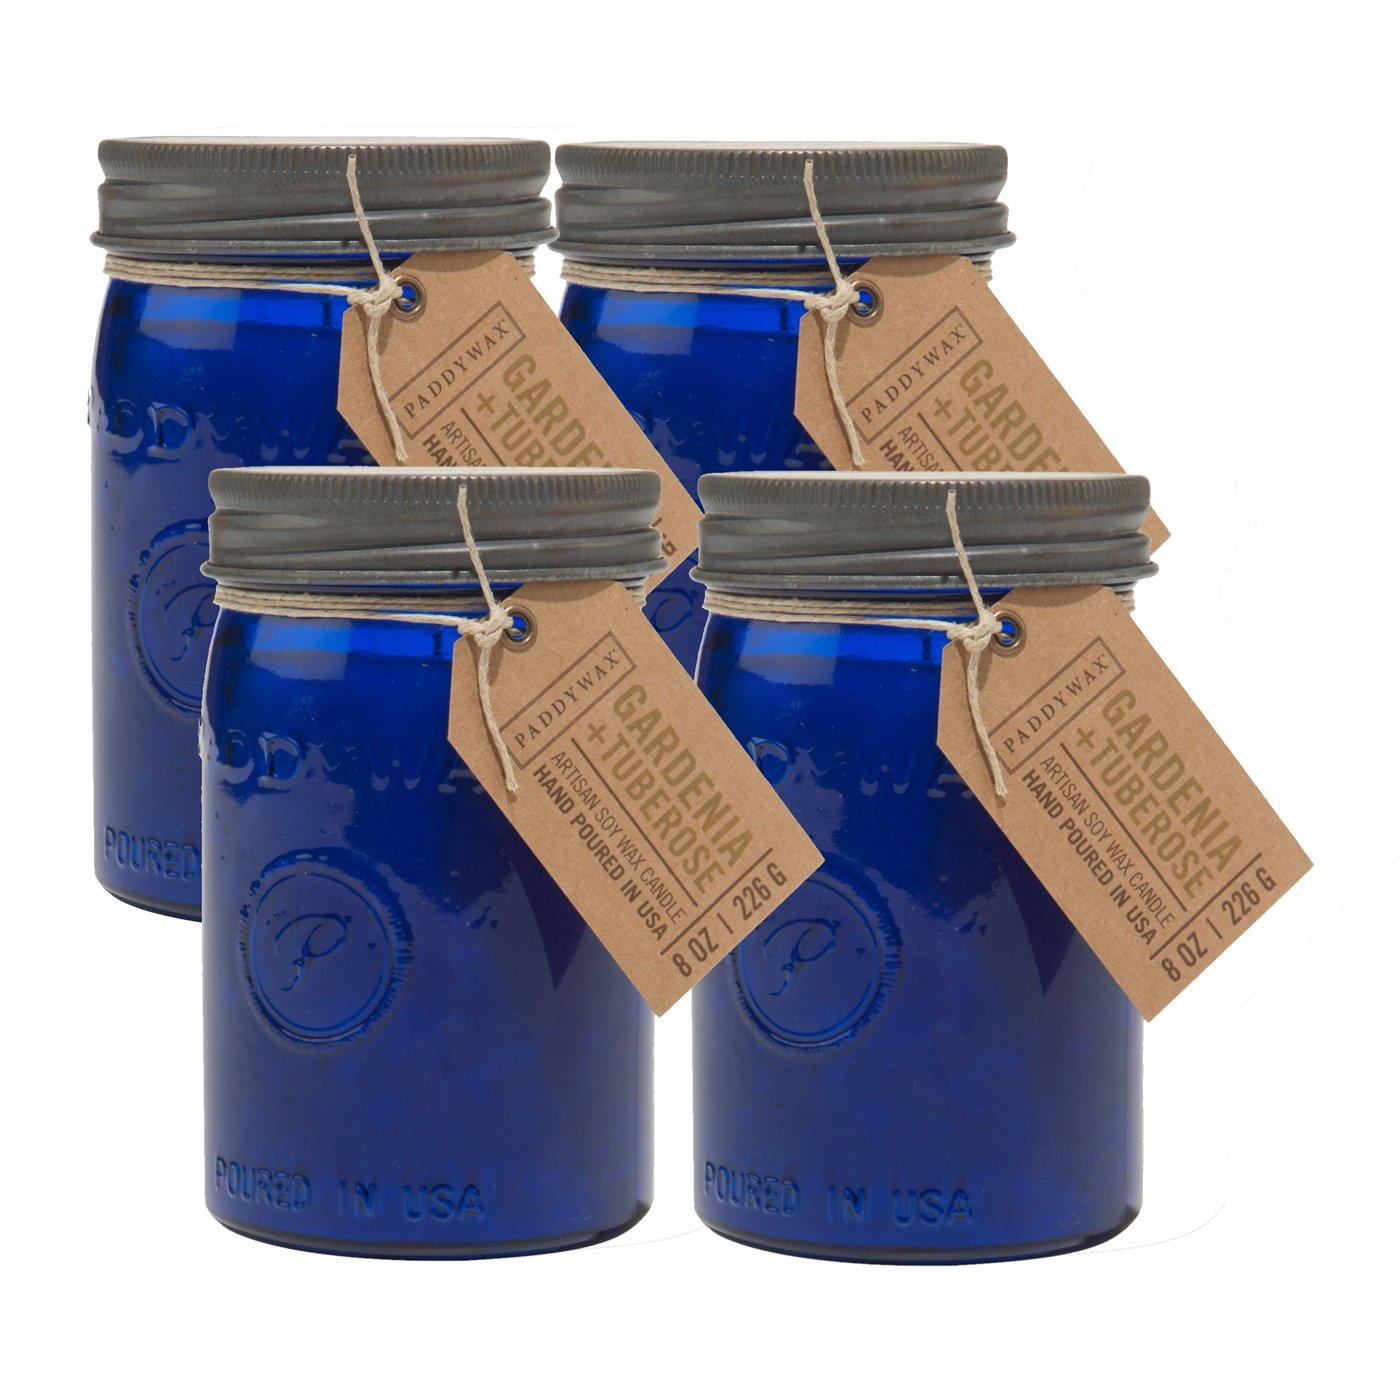 Paddywax Candles Relish Jar Collection Candle, 9.5-Ounce, Cobalt Gardenia & Tuberose - Set of 4